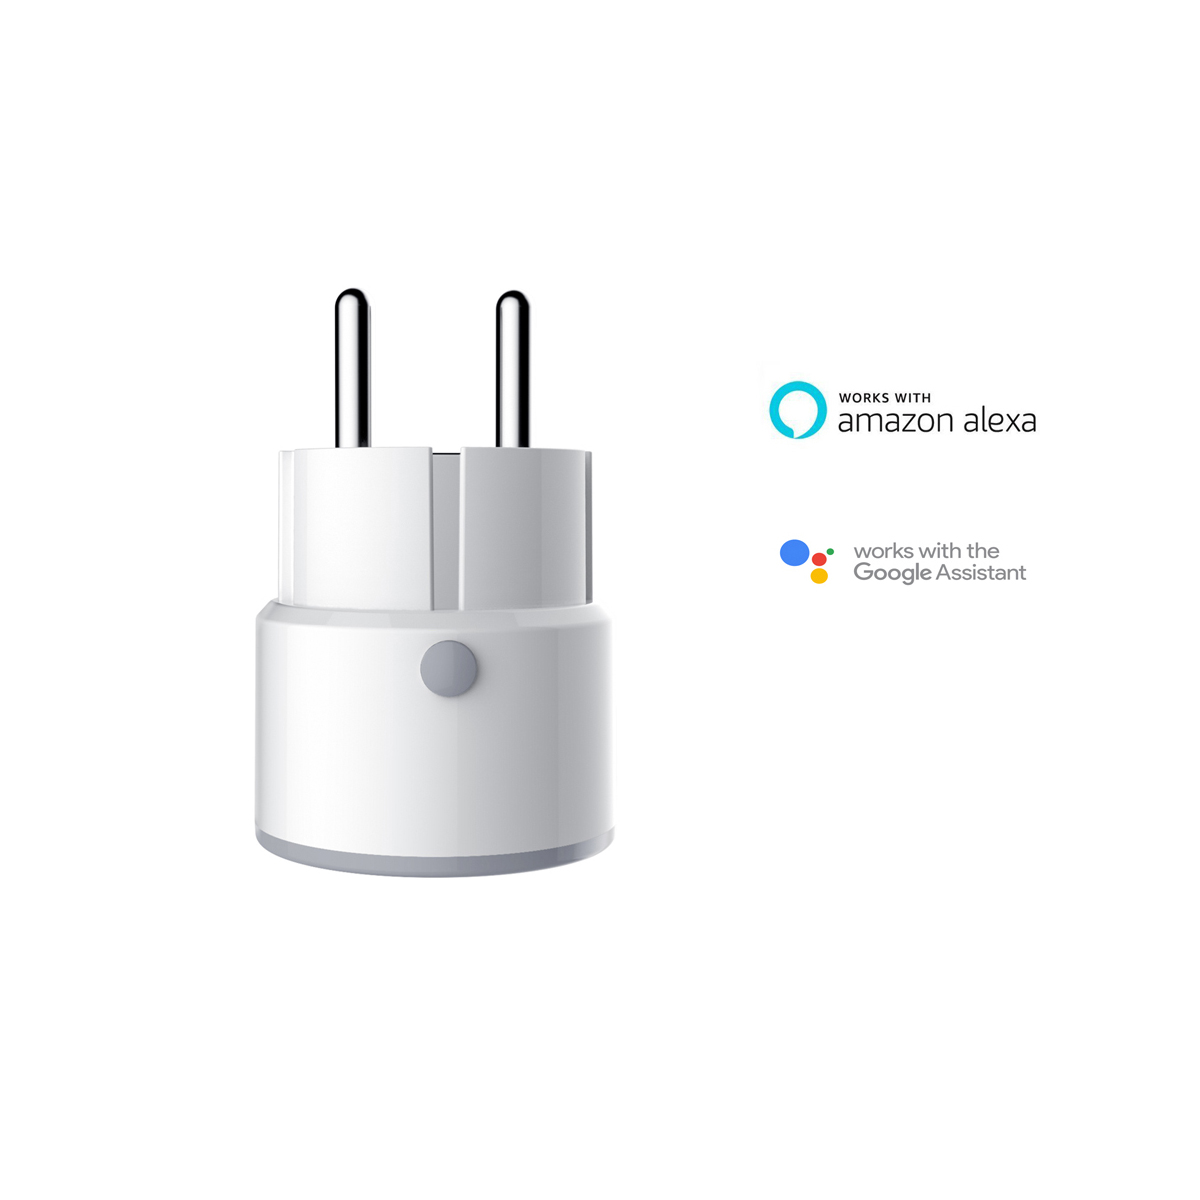 wifi plug install, setting and work with Amazon echo